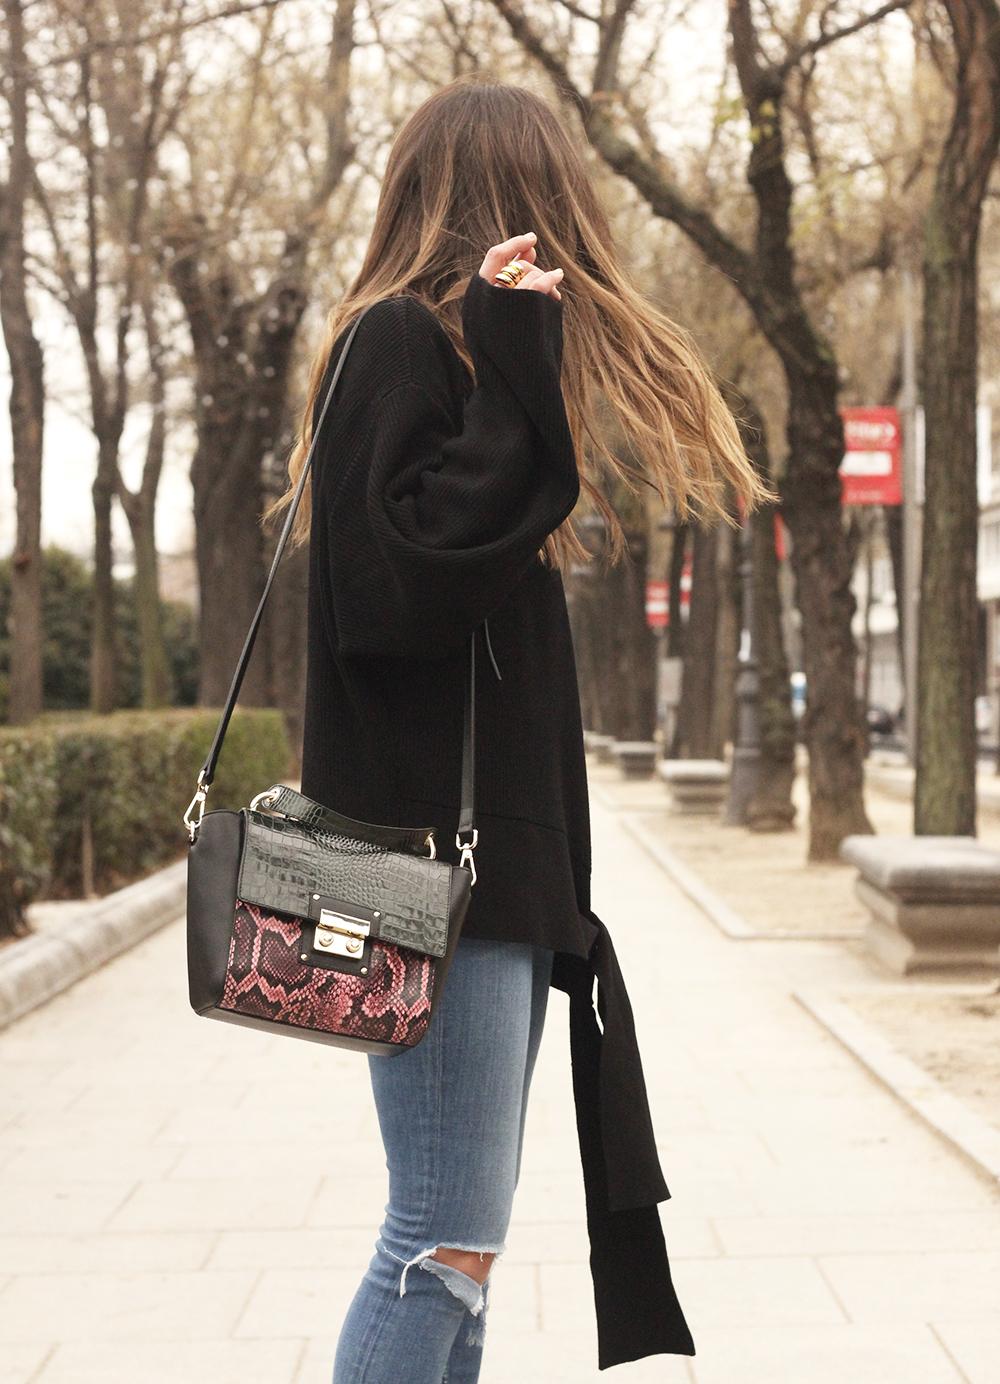 Black turtleneck sweater Uterqüe black ankle boots winter oufit 201812